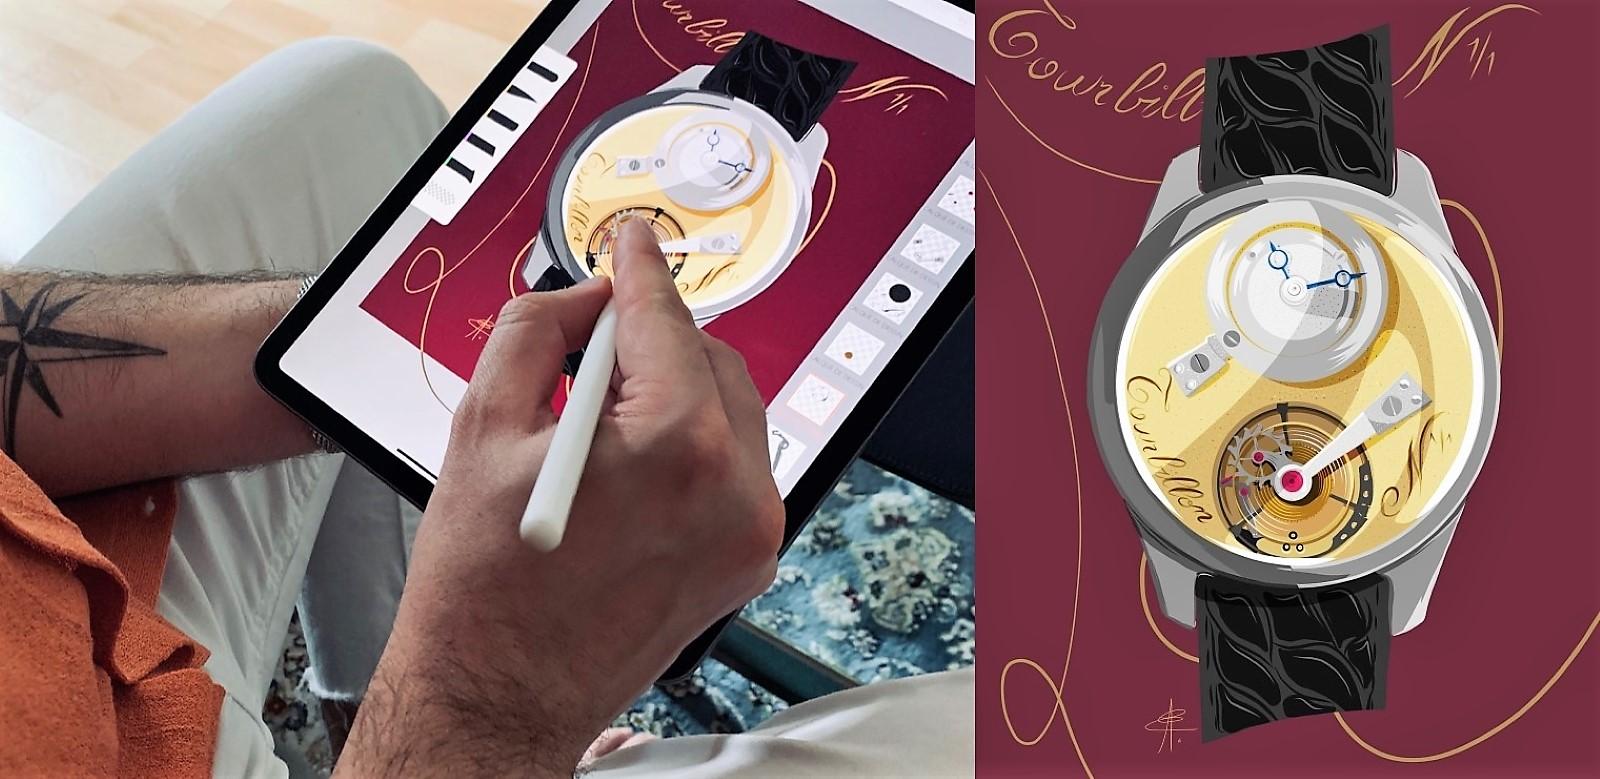 Commissioning Watch Art - Alex Eisenzammer Remy Cools Tourbillon